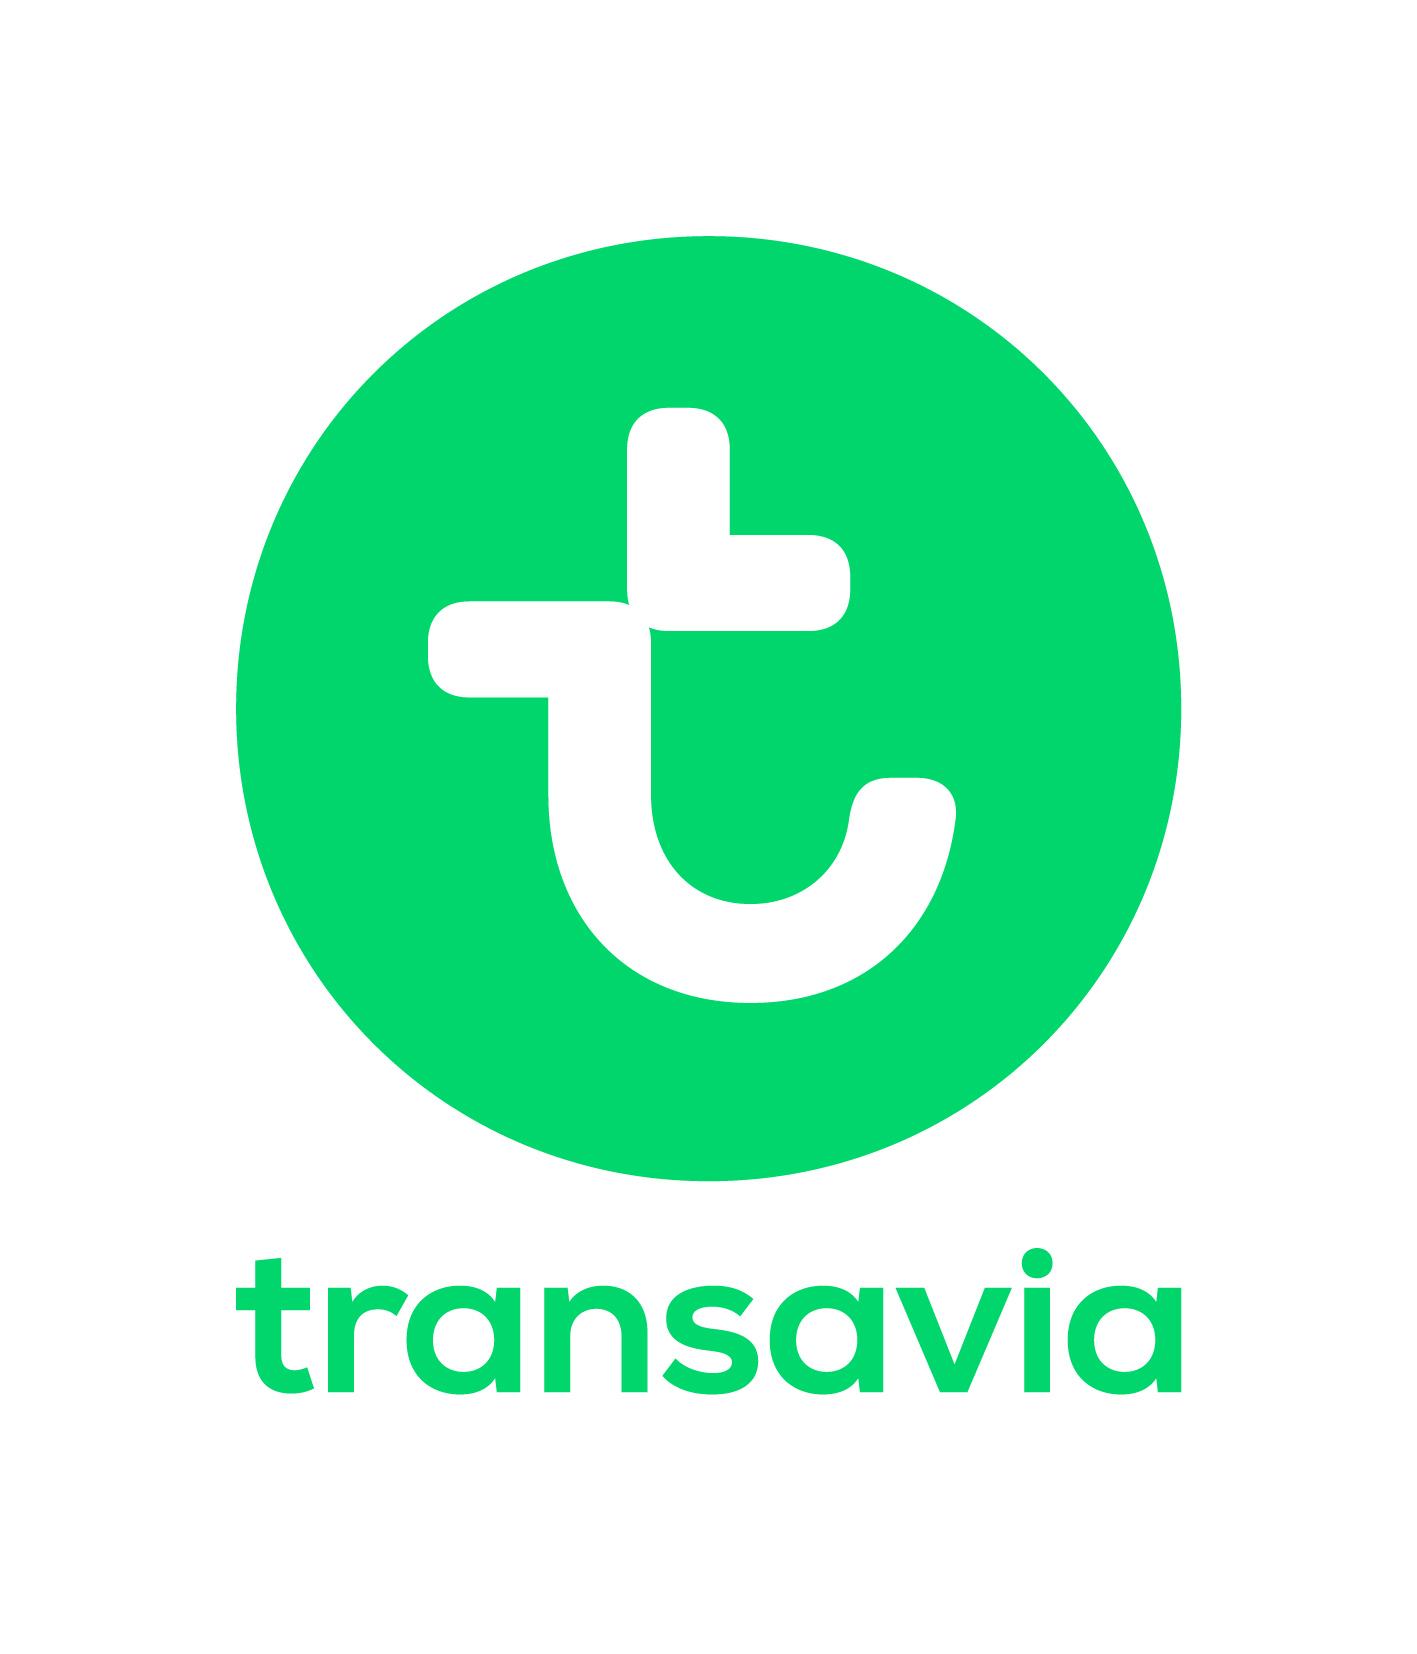 Transavia_Isologotype